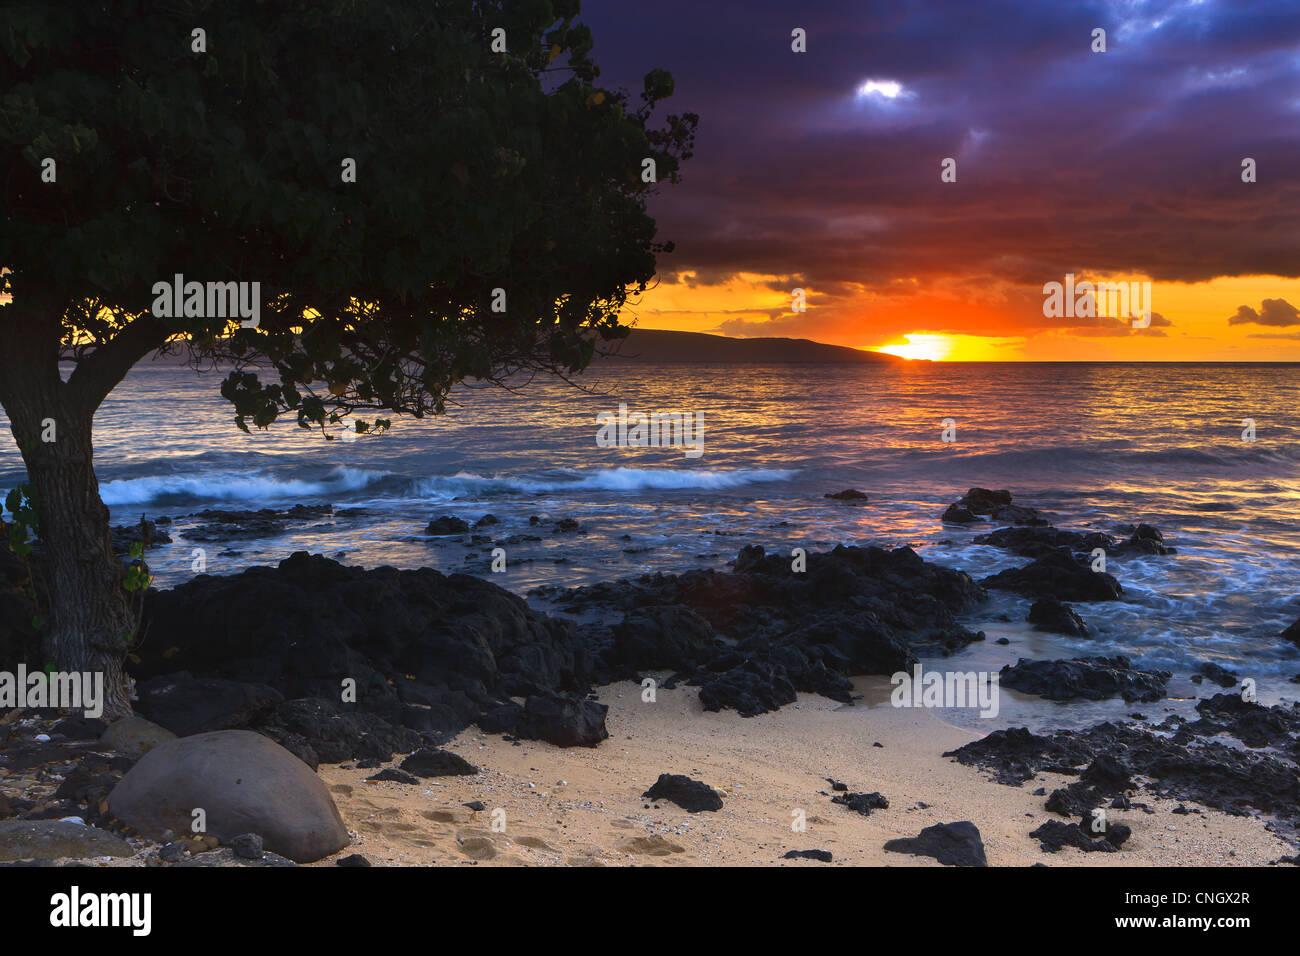 Sunset at Ahihi Kinau Natural Area Reserve, Maui, Hawaii - Stock Image